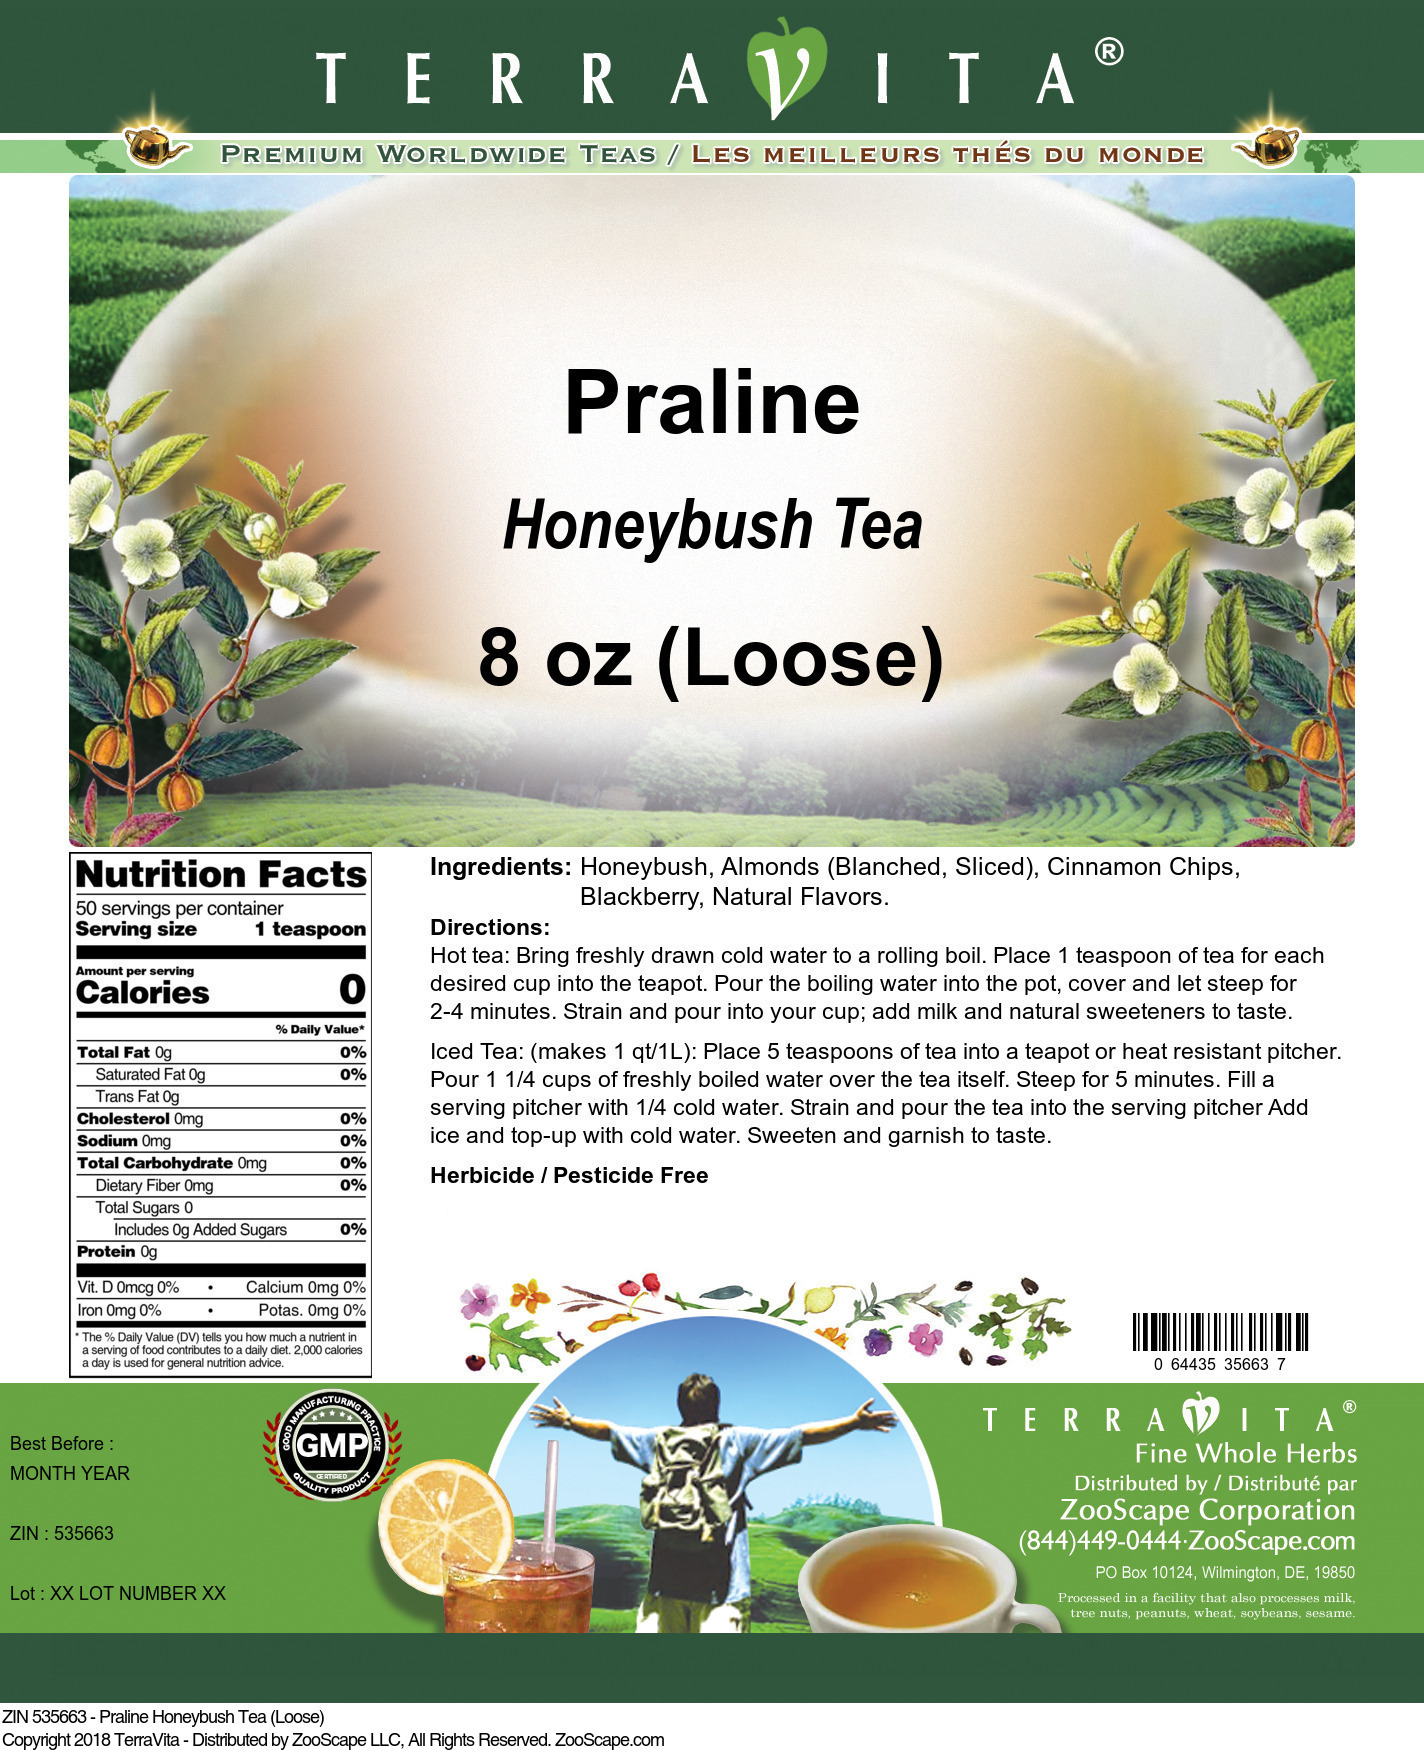 Praline Honeybush Tea (Loose)